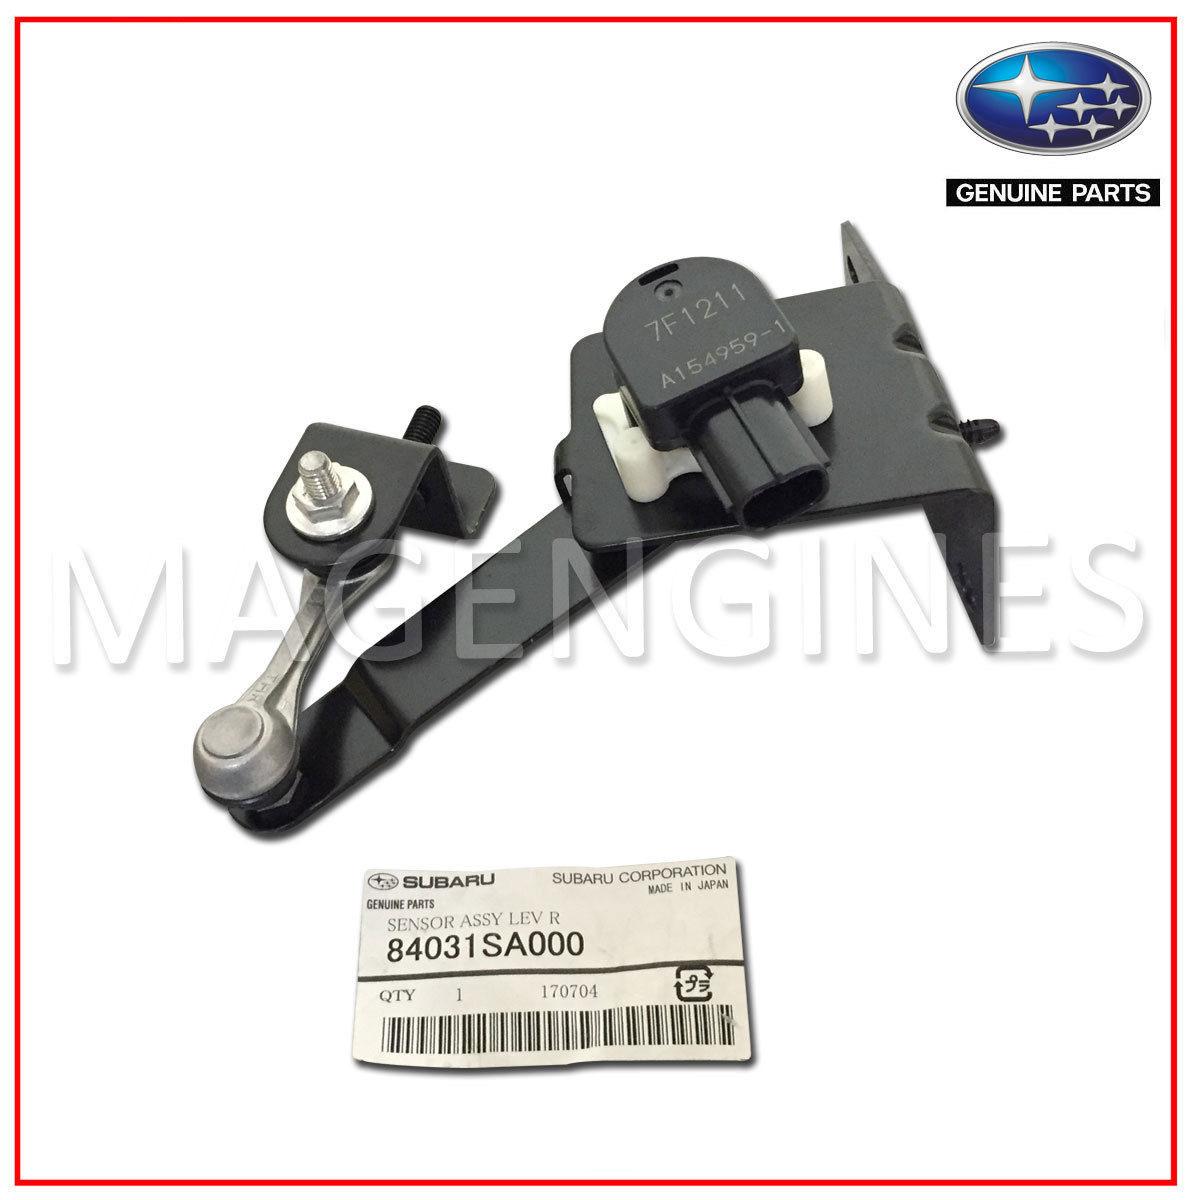 84031AG000 Genuine Subaru SENSOR ASSY LEV R 84031-AG000